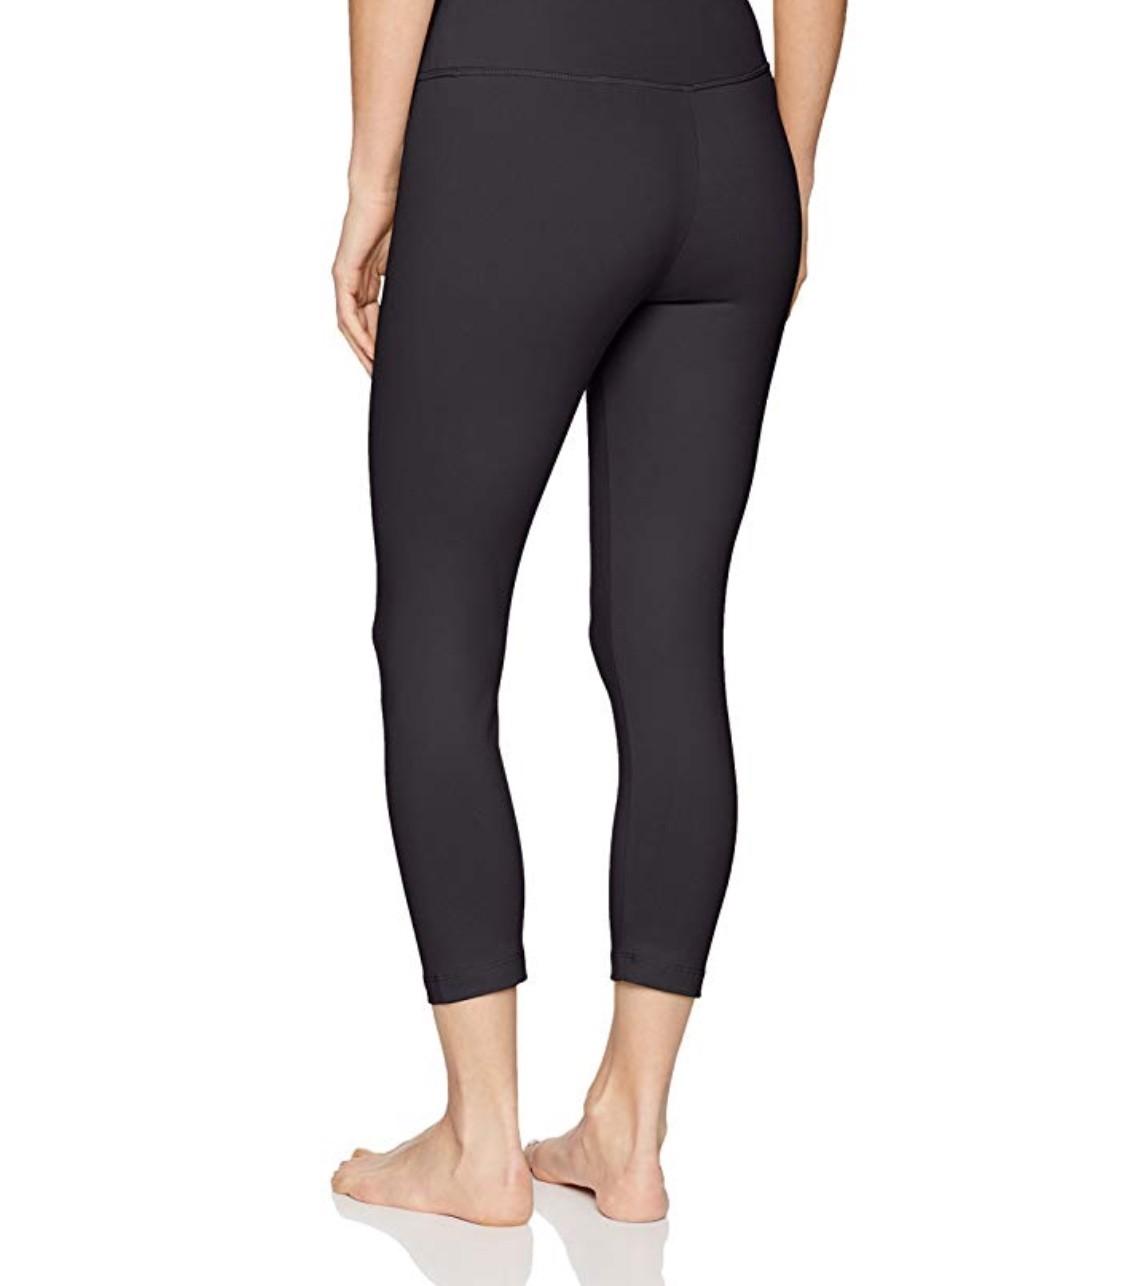 f25741c2d39ba5 Danskin Women's Signature Yoga Capri Legging Size M for Pants